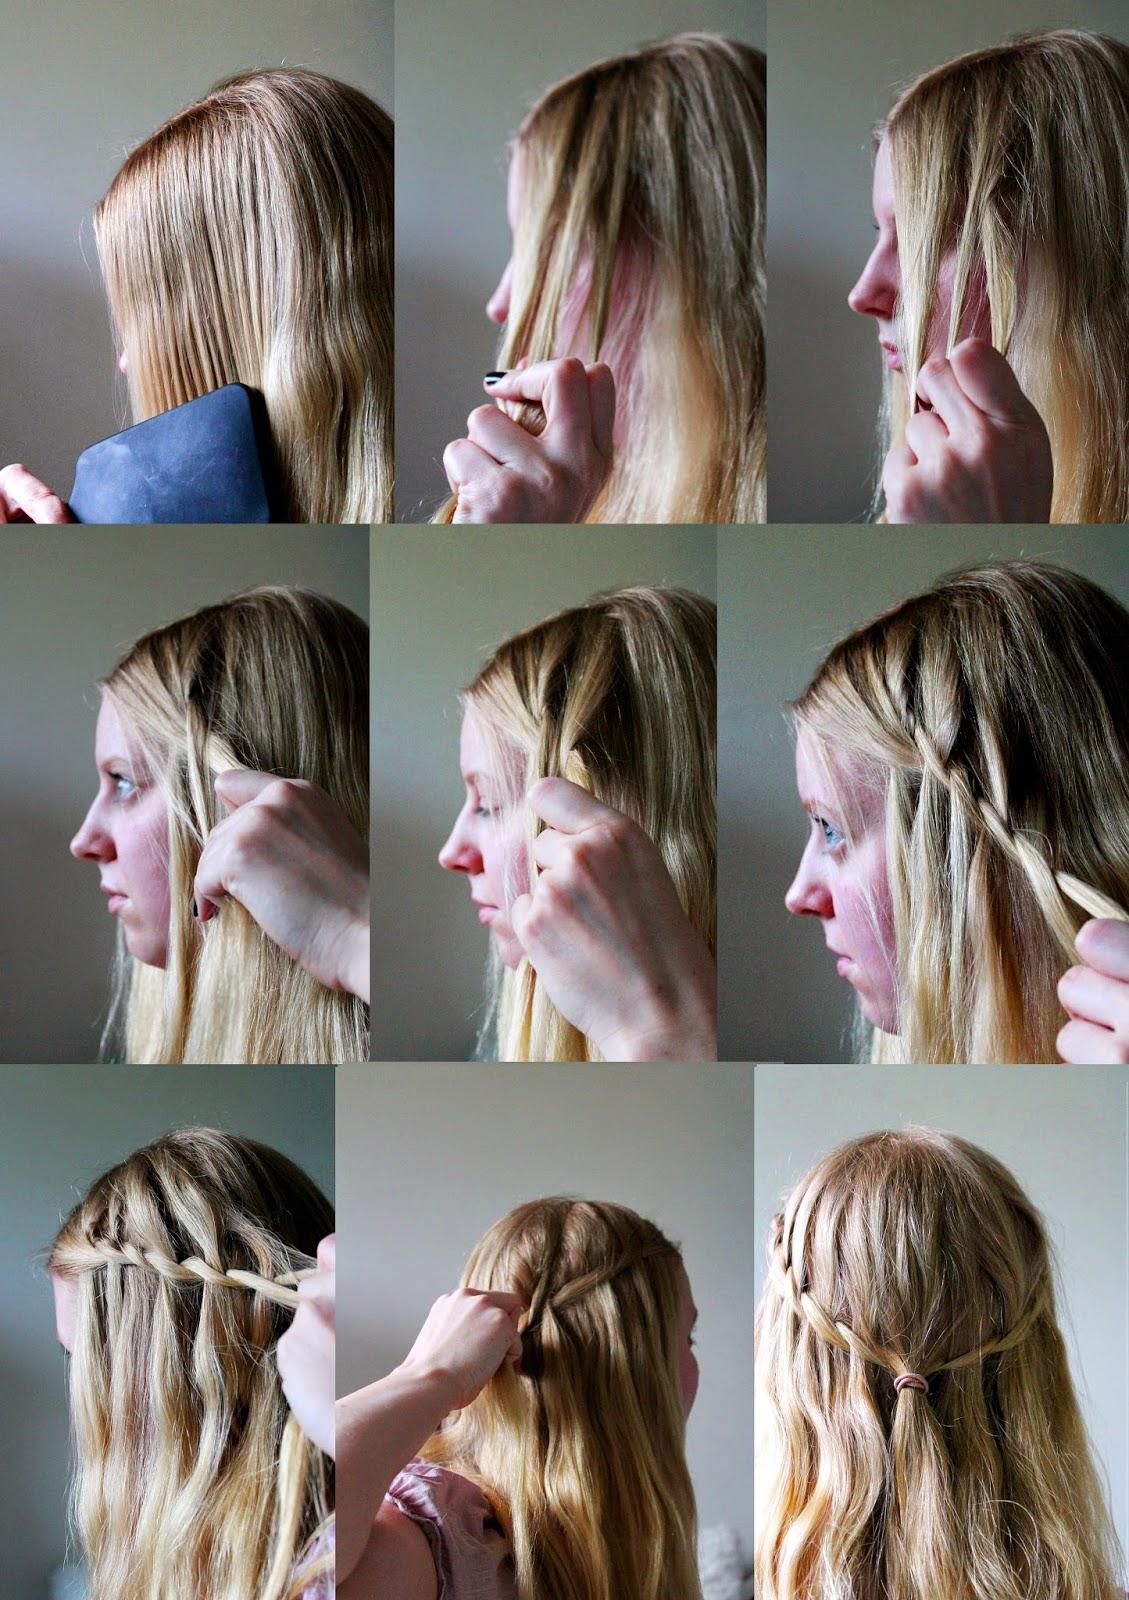 Waterfall braid how to | Alinan kotona blog